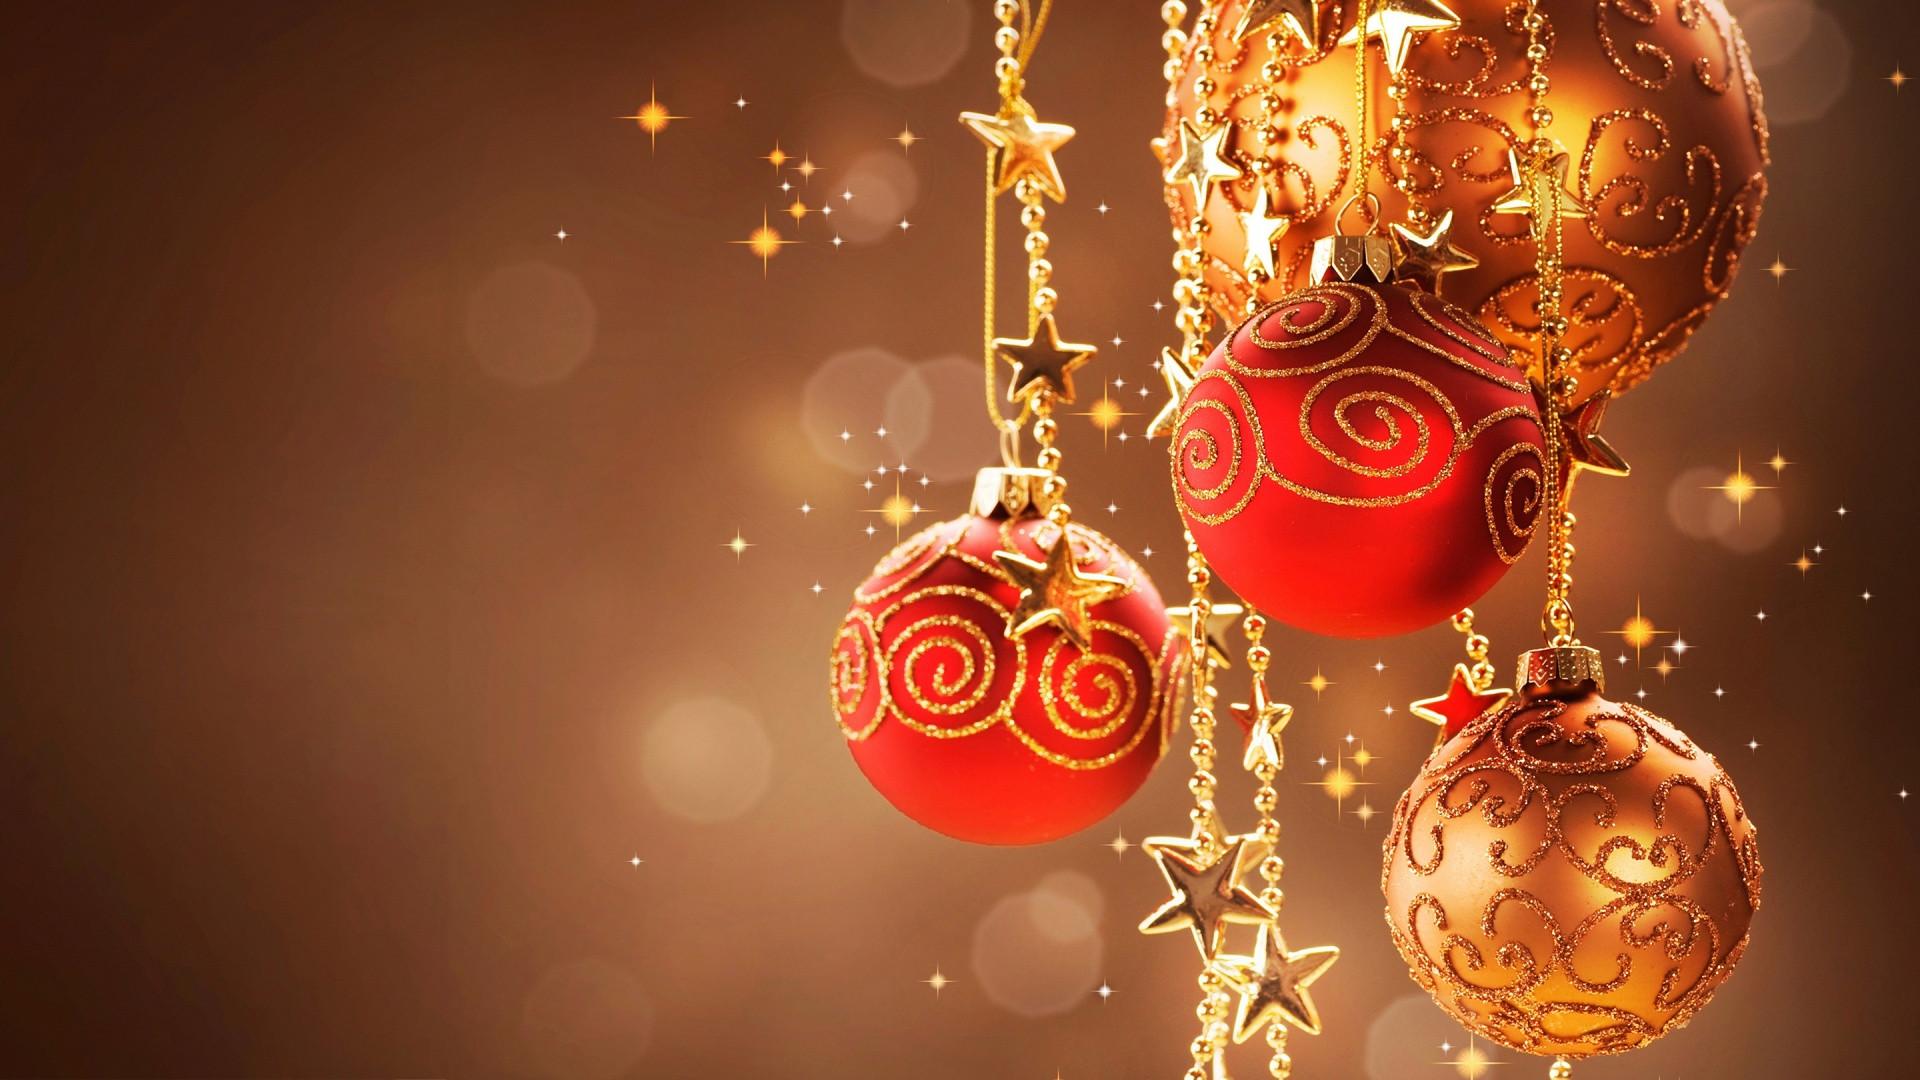 1920x1080-Sparkling-christmas-balls-wallpaper-wp360869